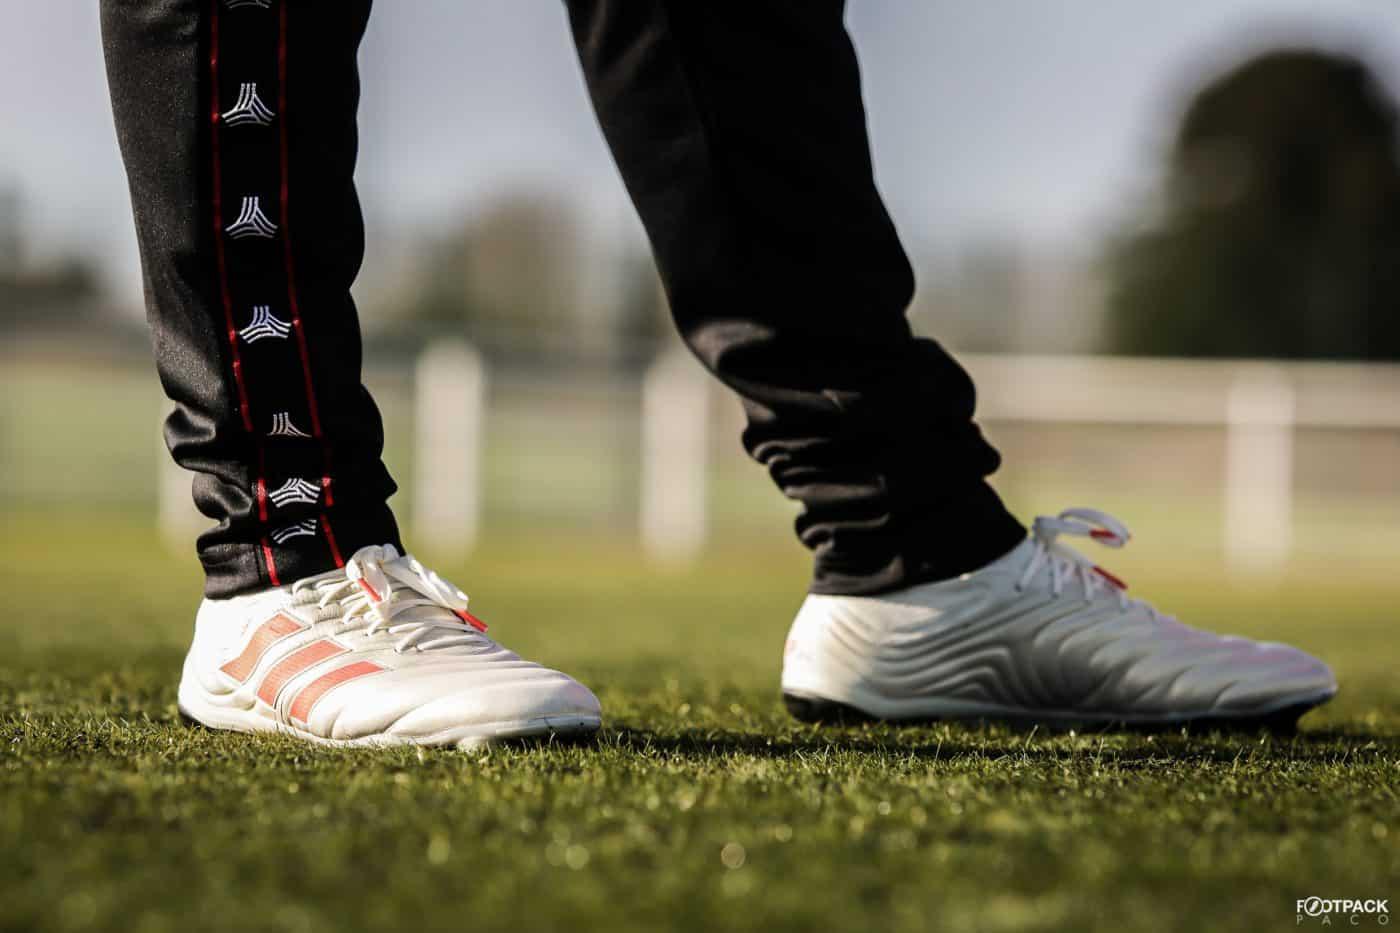 adidas-copa-19.1-footpack-d